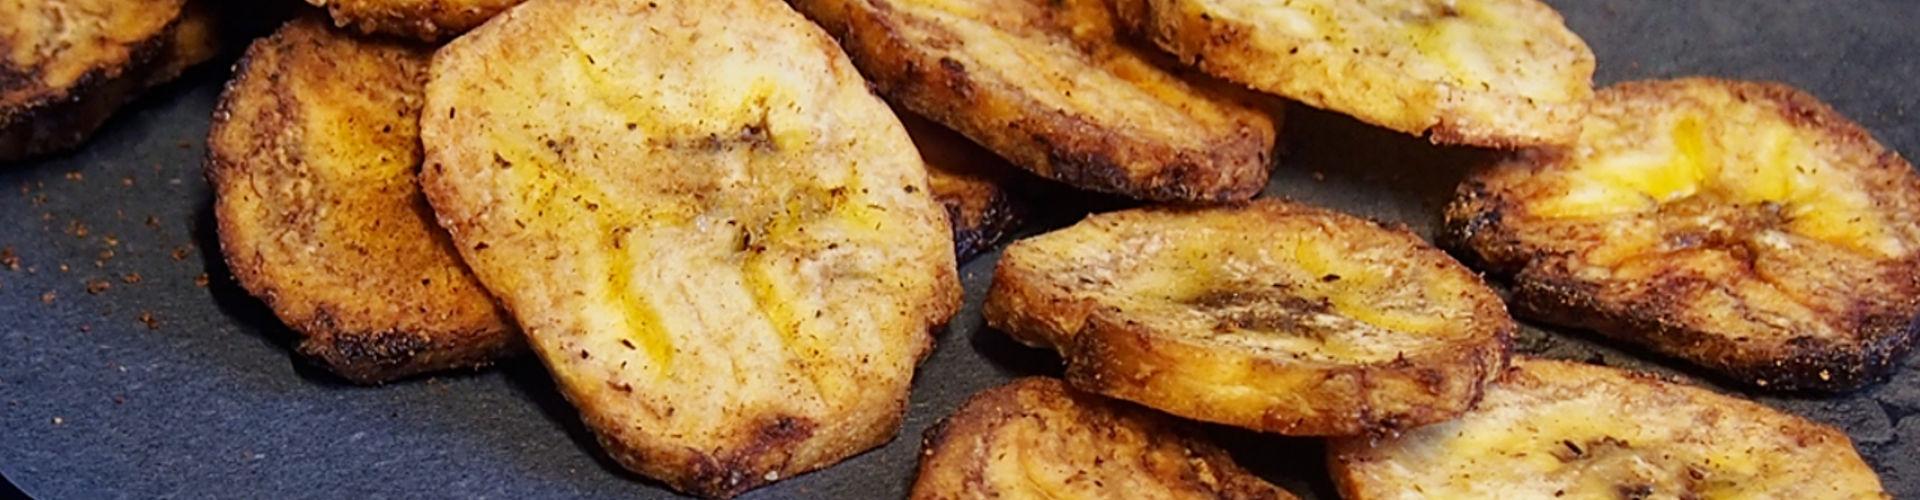 Pikante-Kochbananen-mit-Guacamole